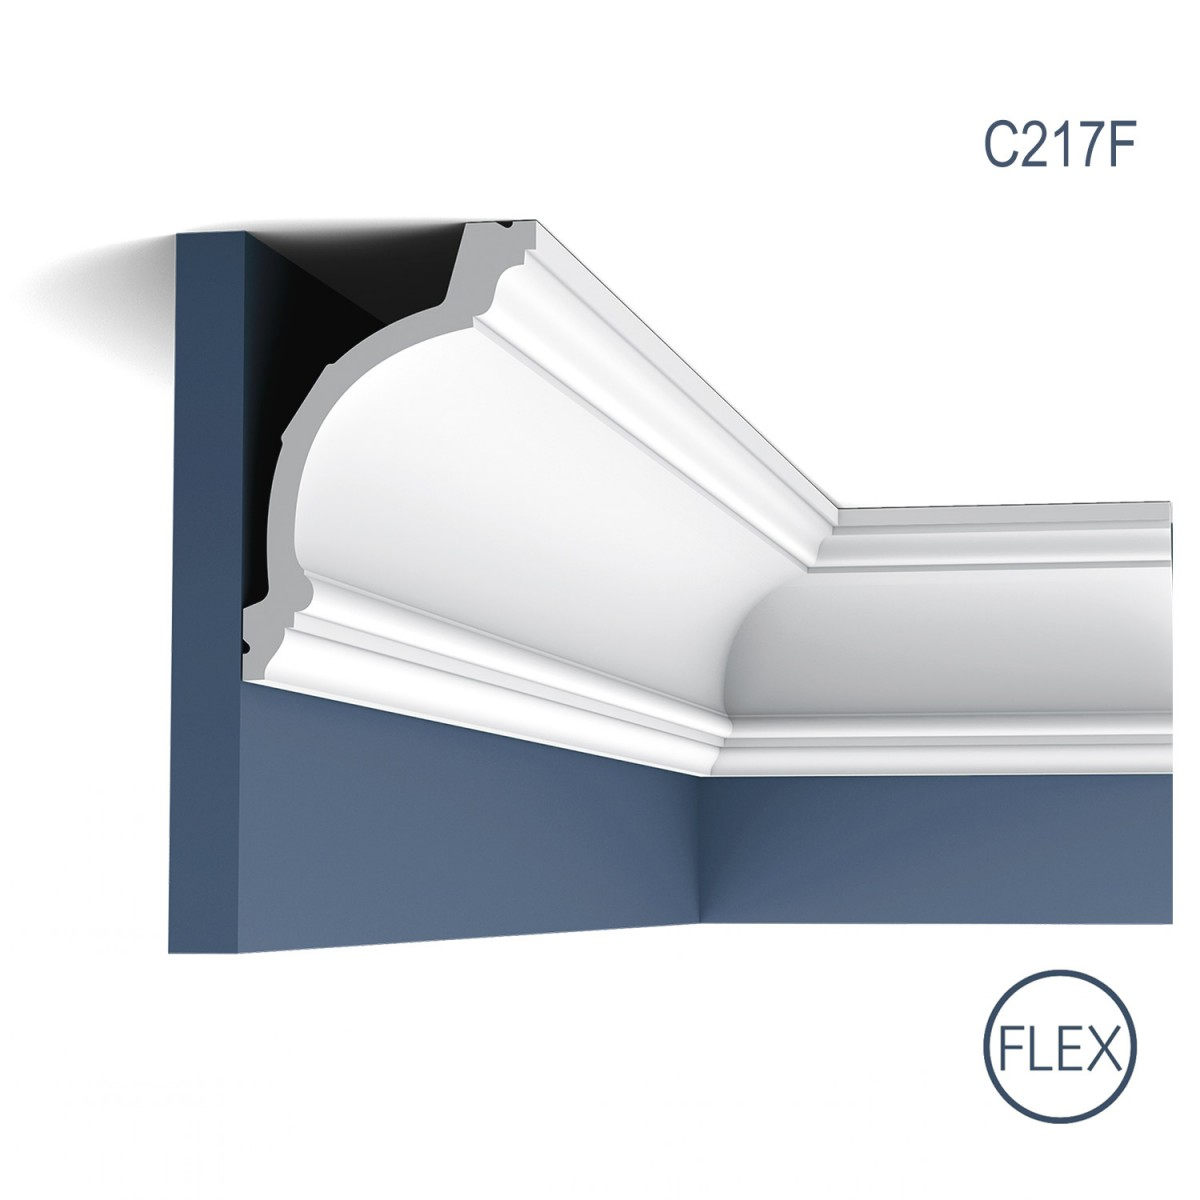 Cornisa Flex Luxxus C217F, Dimensiuni: 200 X 15.6 X 10.3 cm, Orac Decor